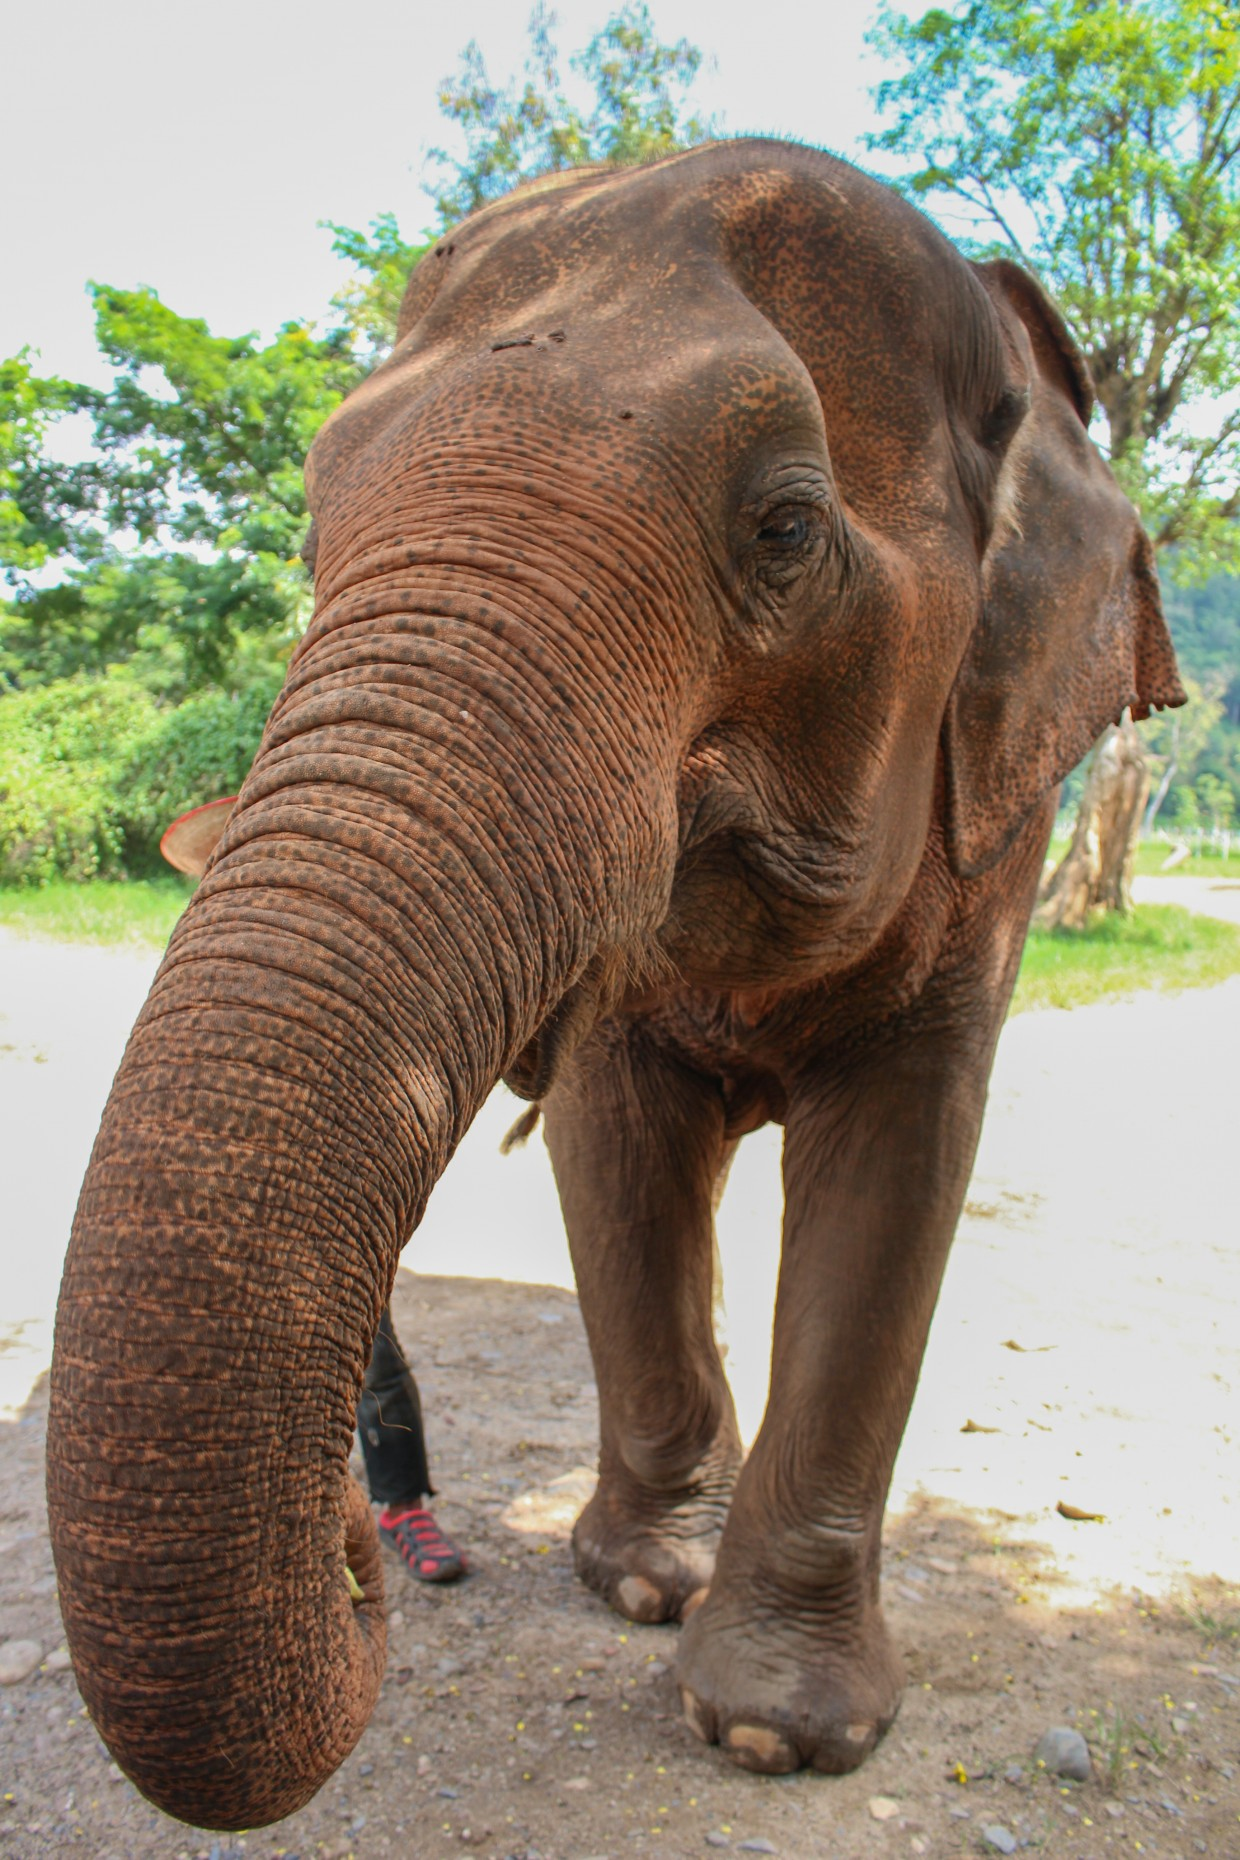 Elephant at the Elephant Nature Park